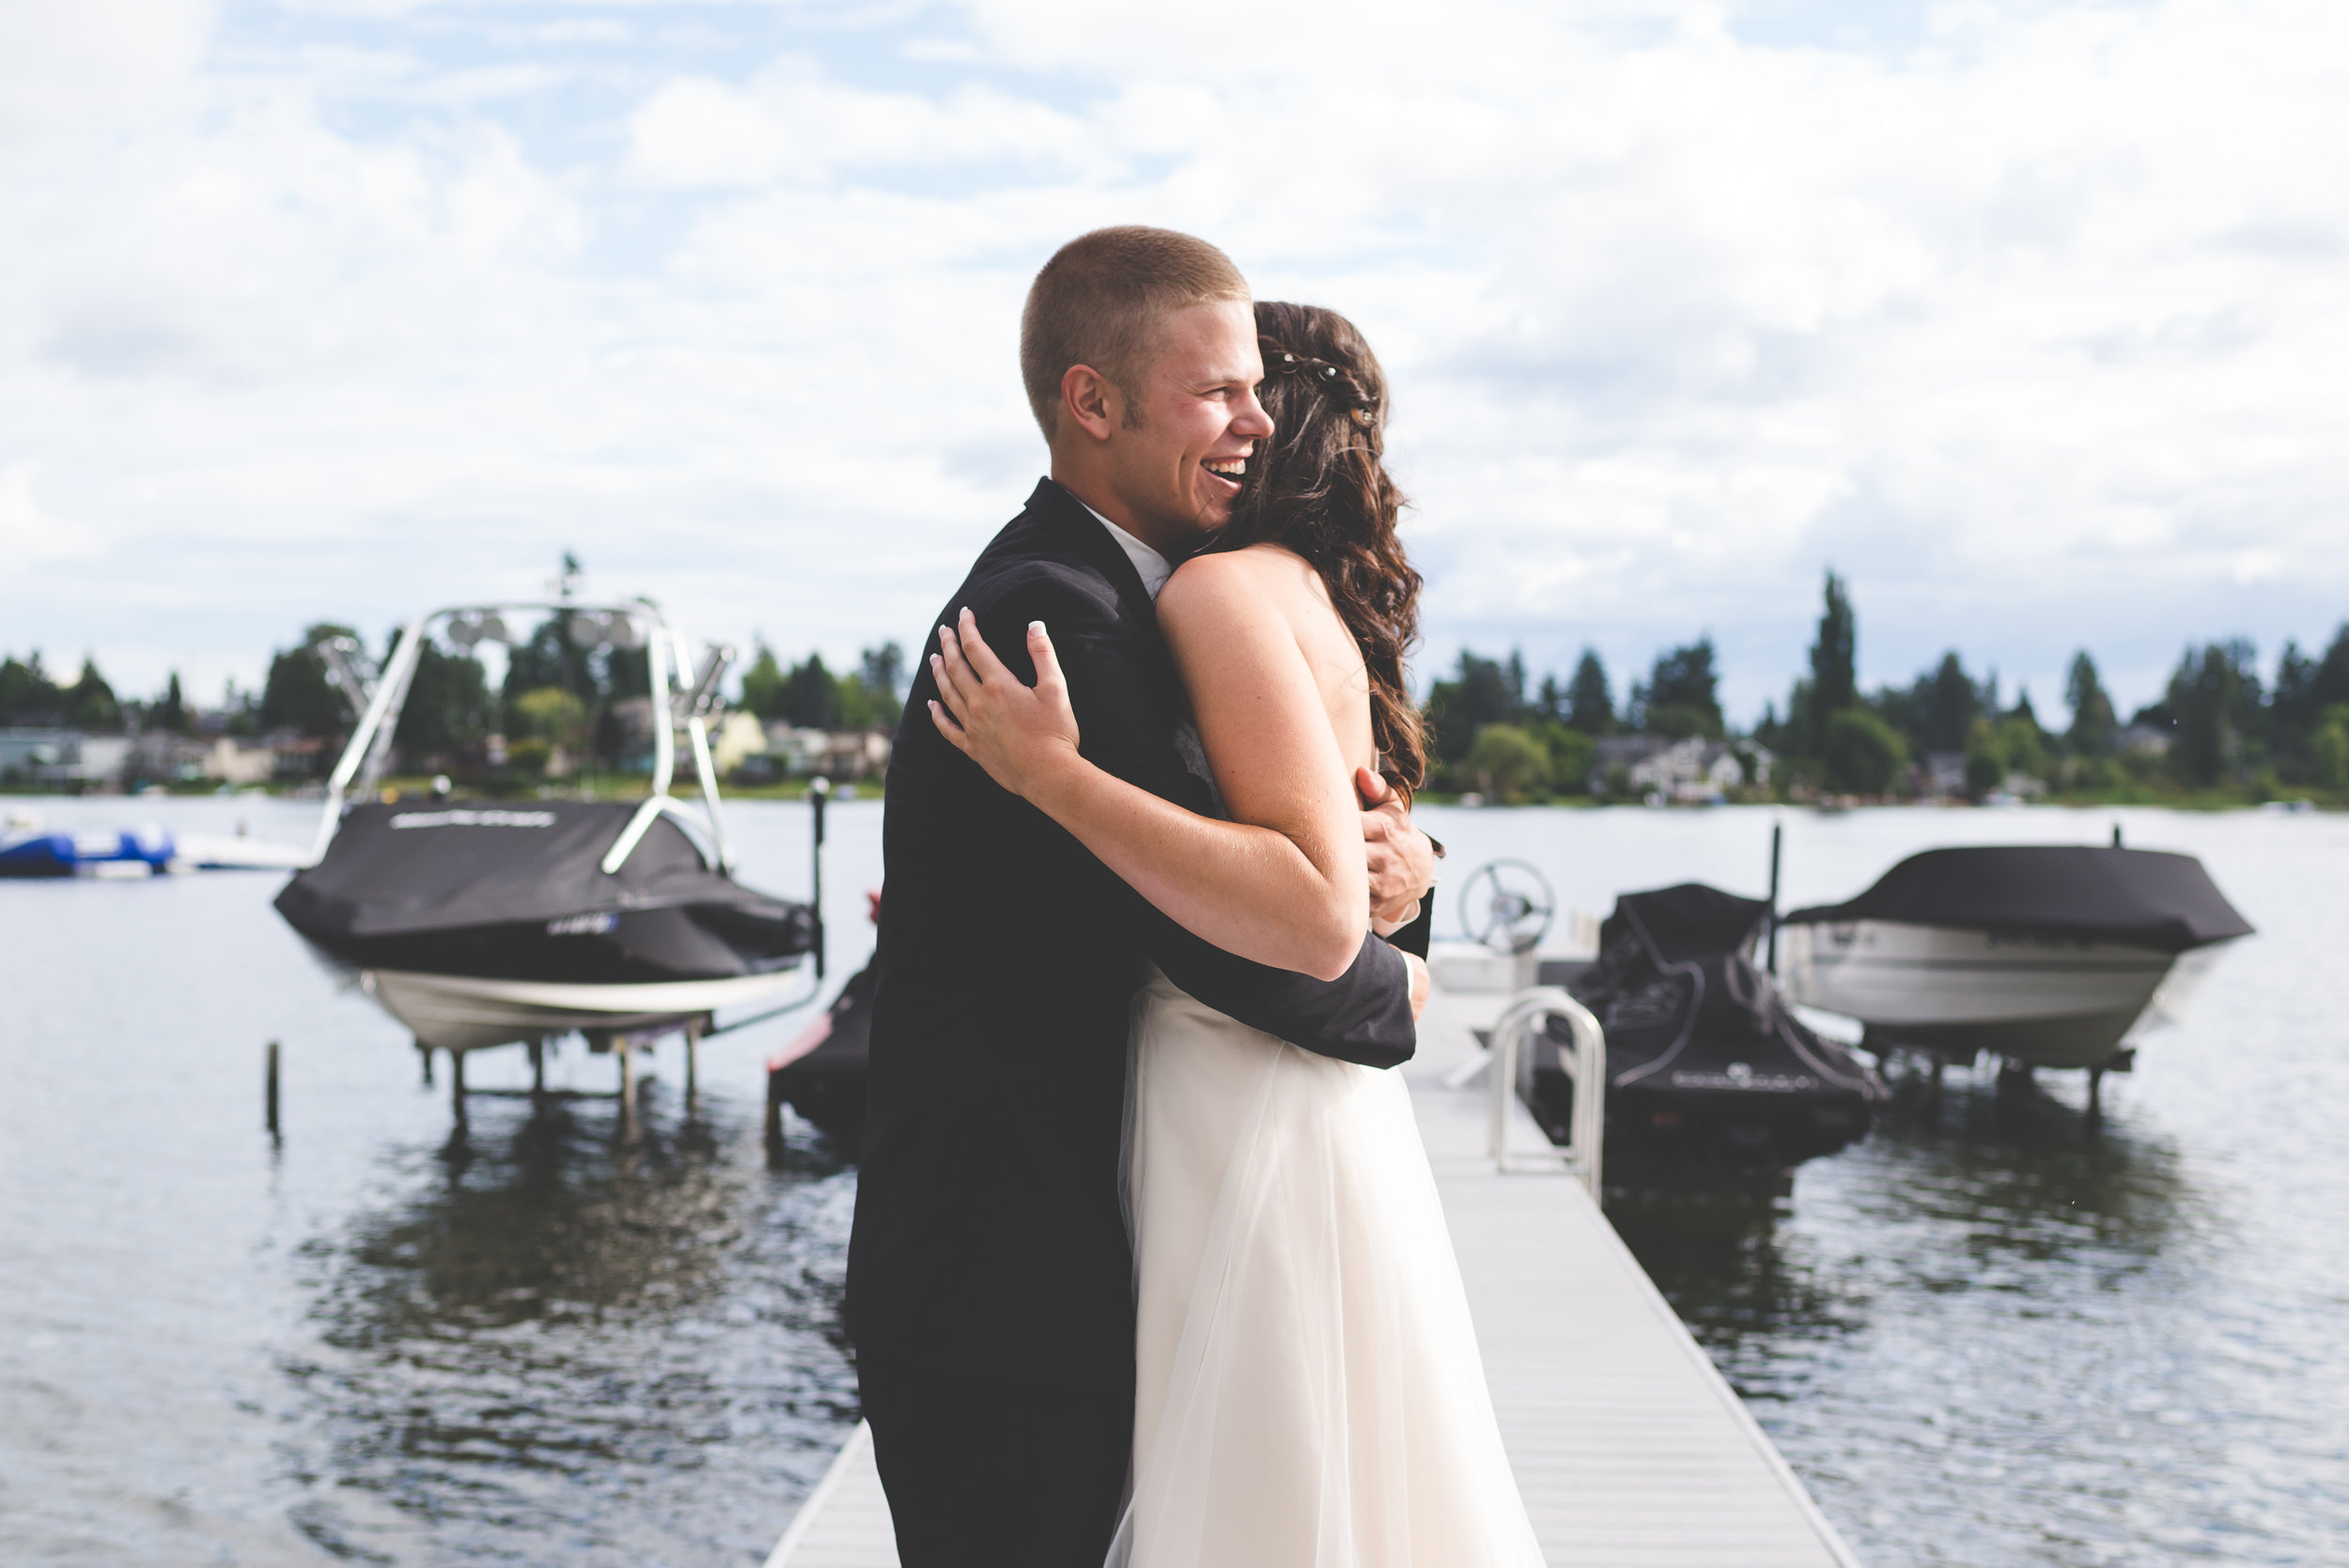 alaska-intimate-wedding-photographer21.jpg